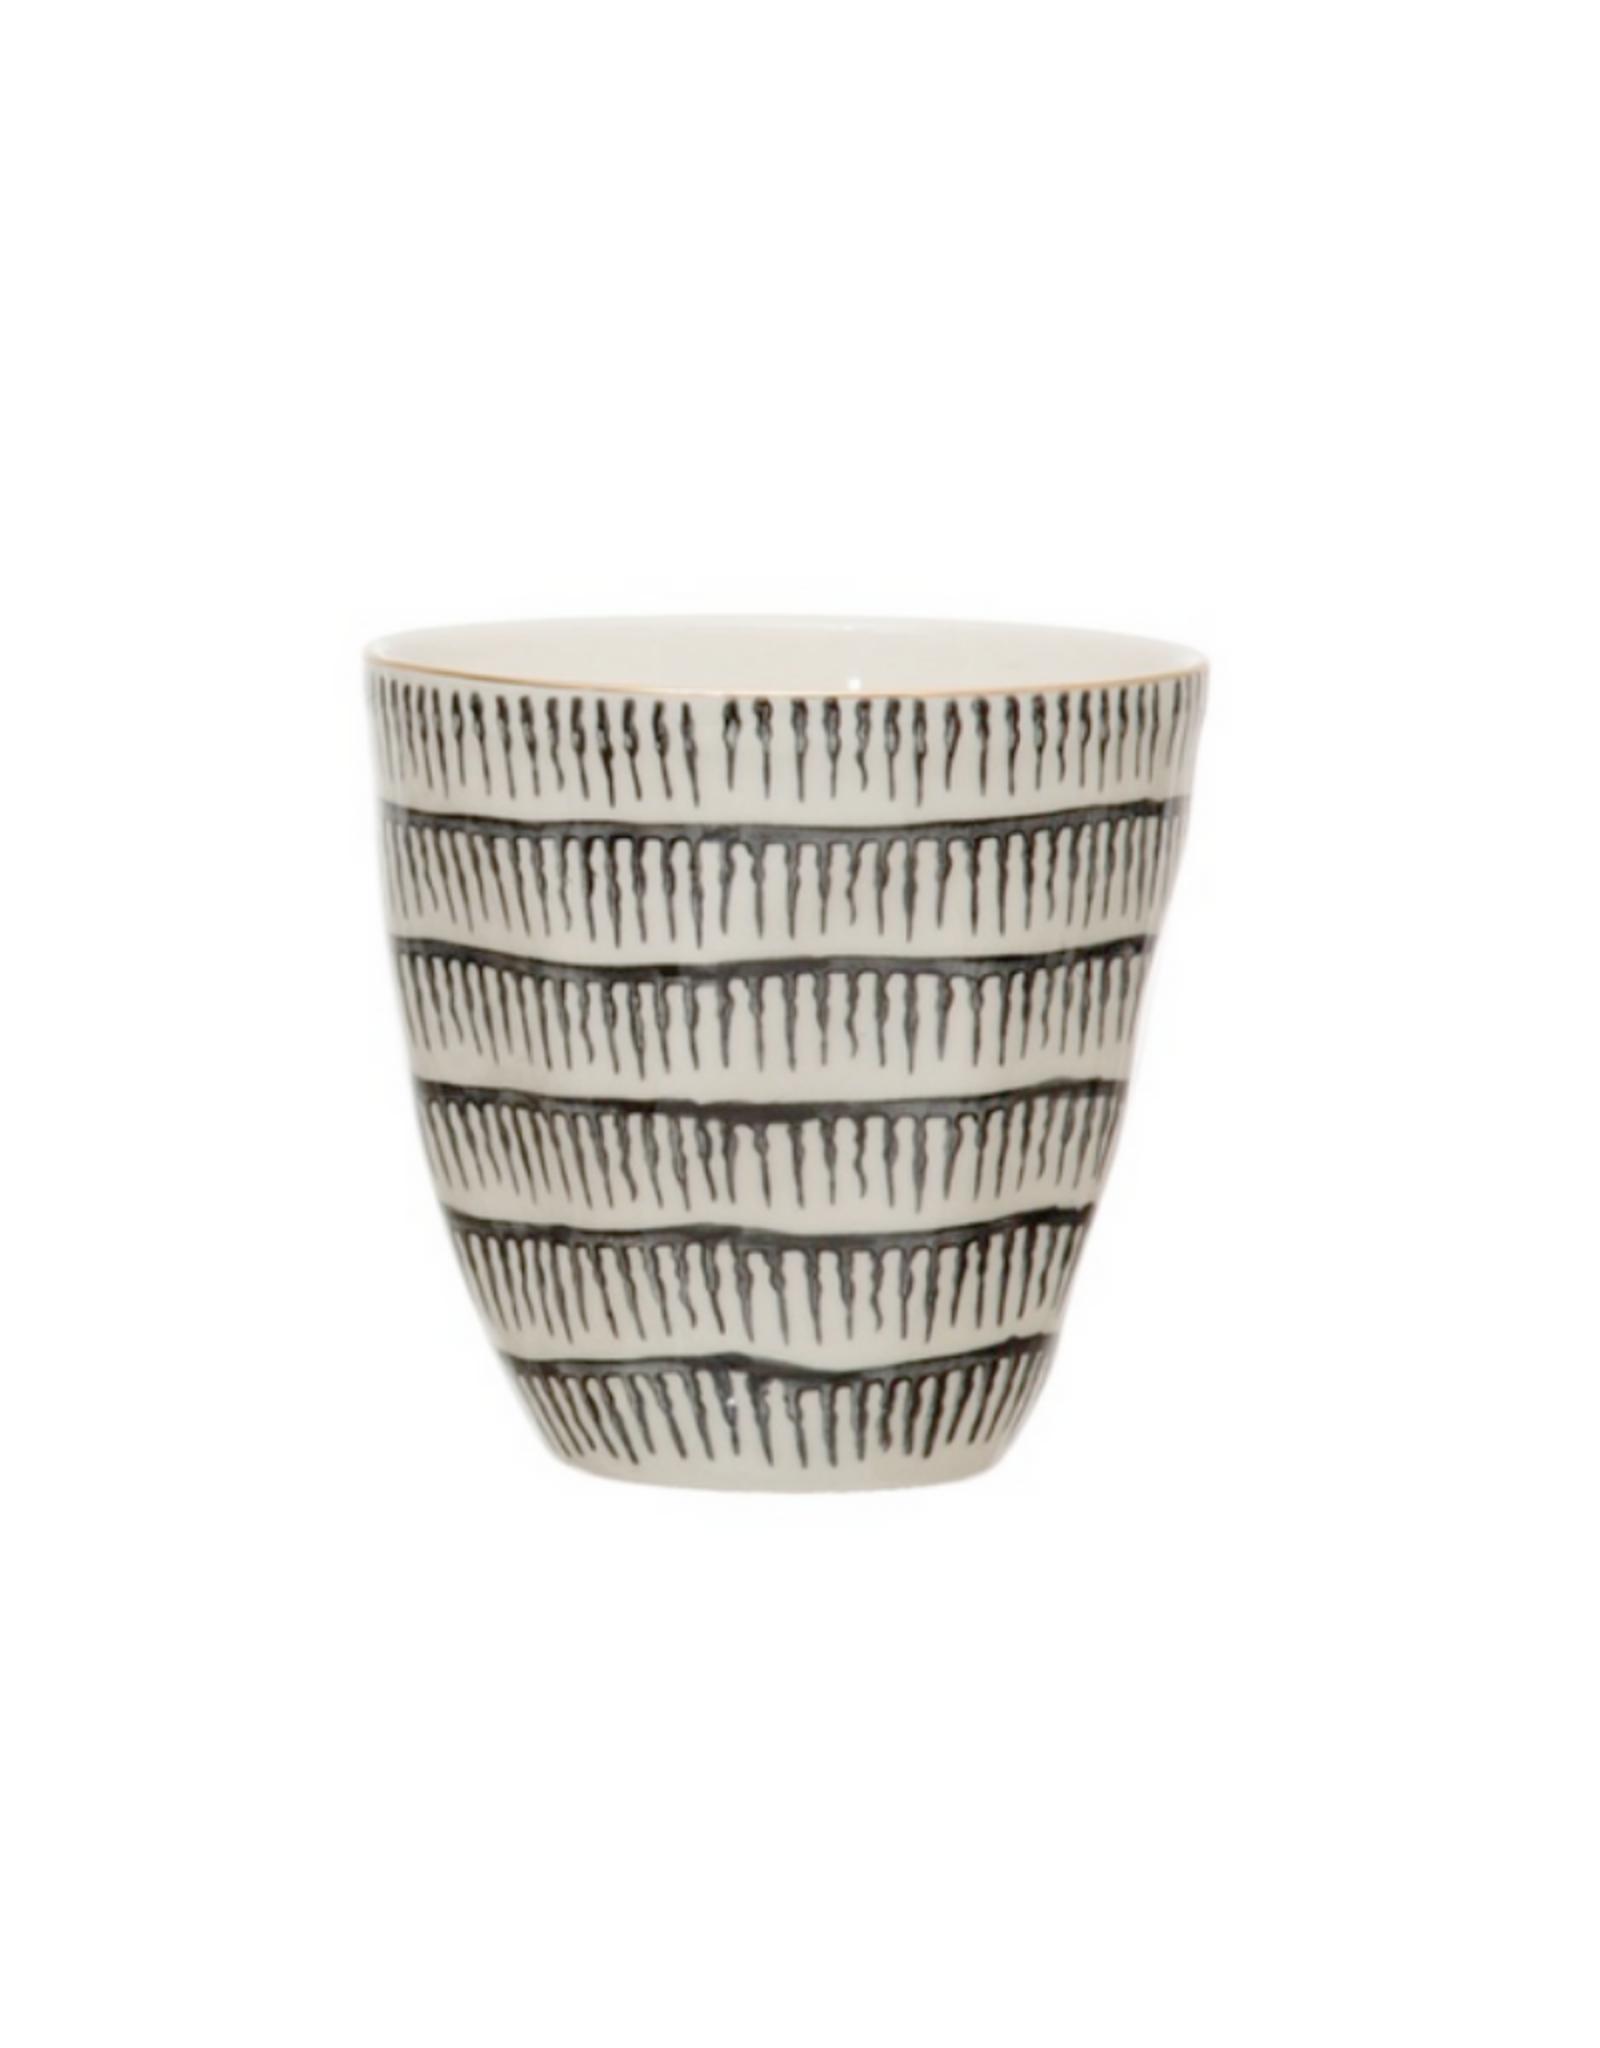 CUP-BLK/WHITE PATTERN, ELECTROPLATING, 8OZ